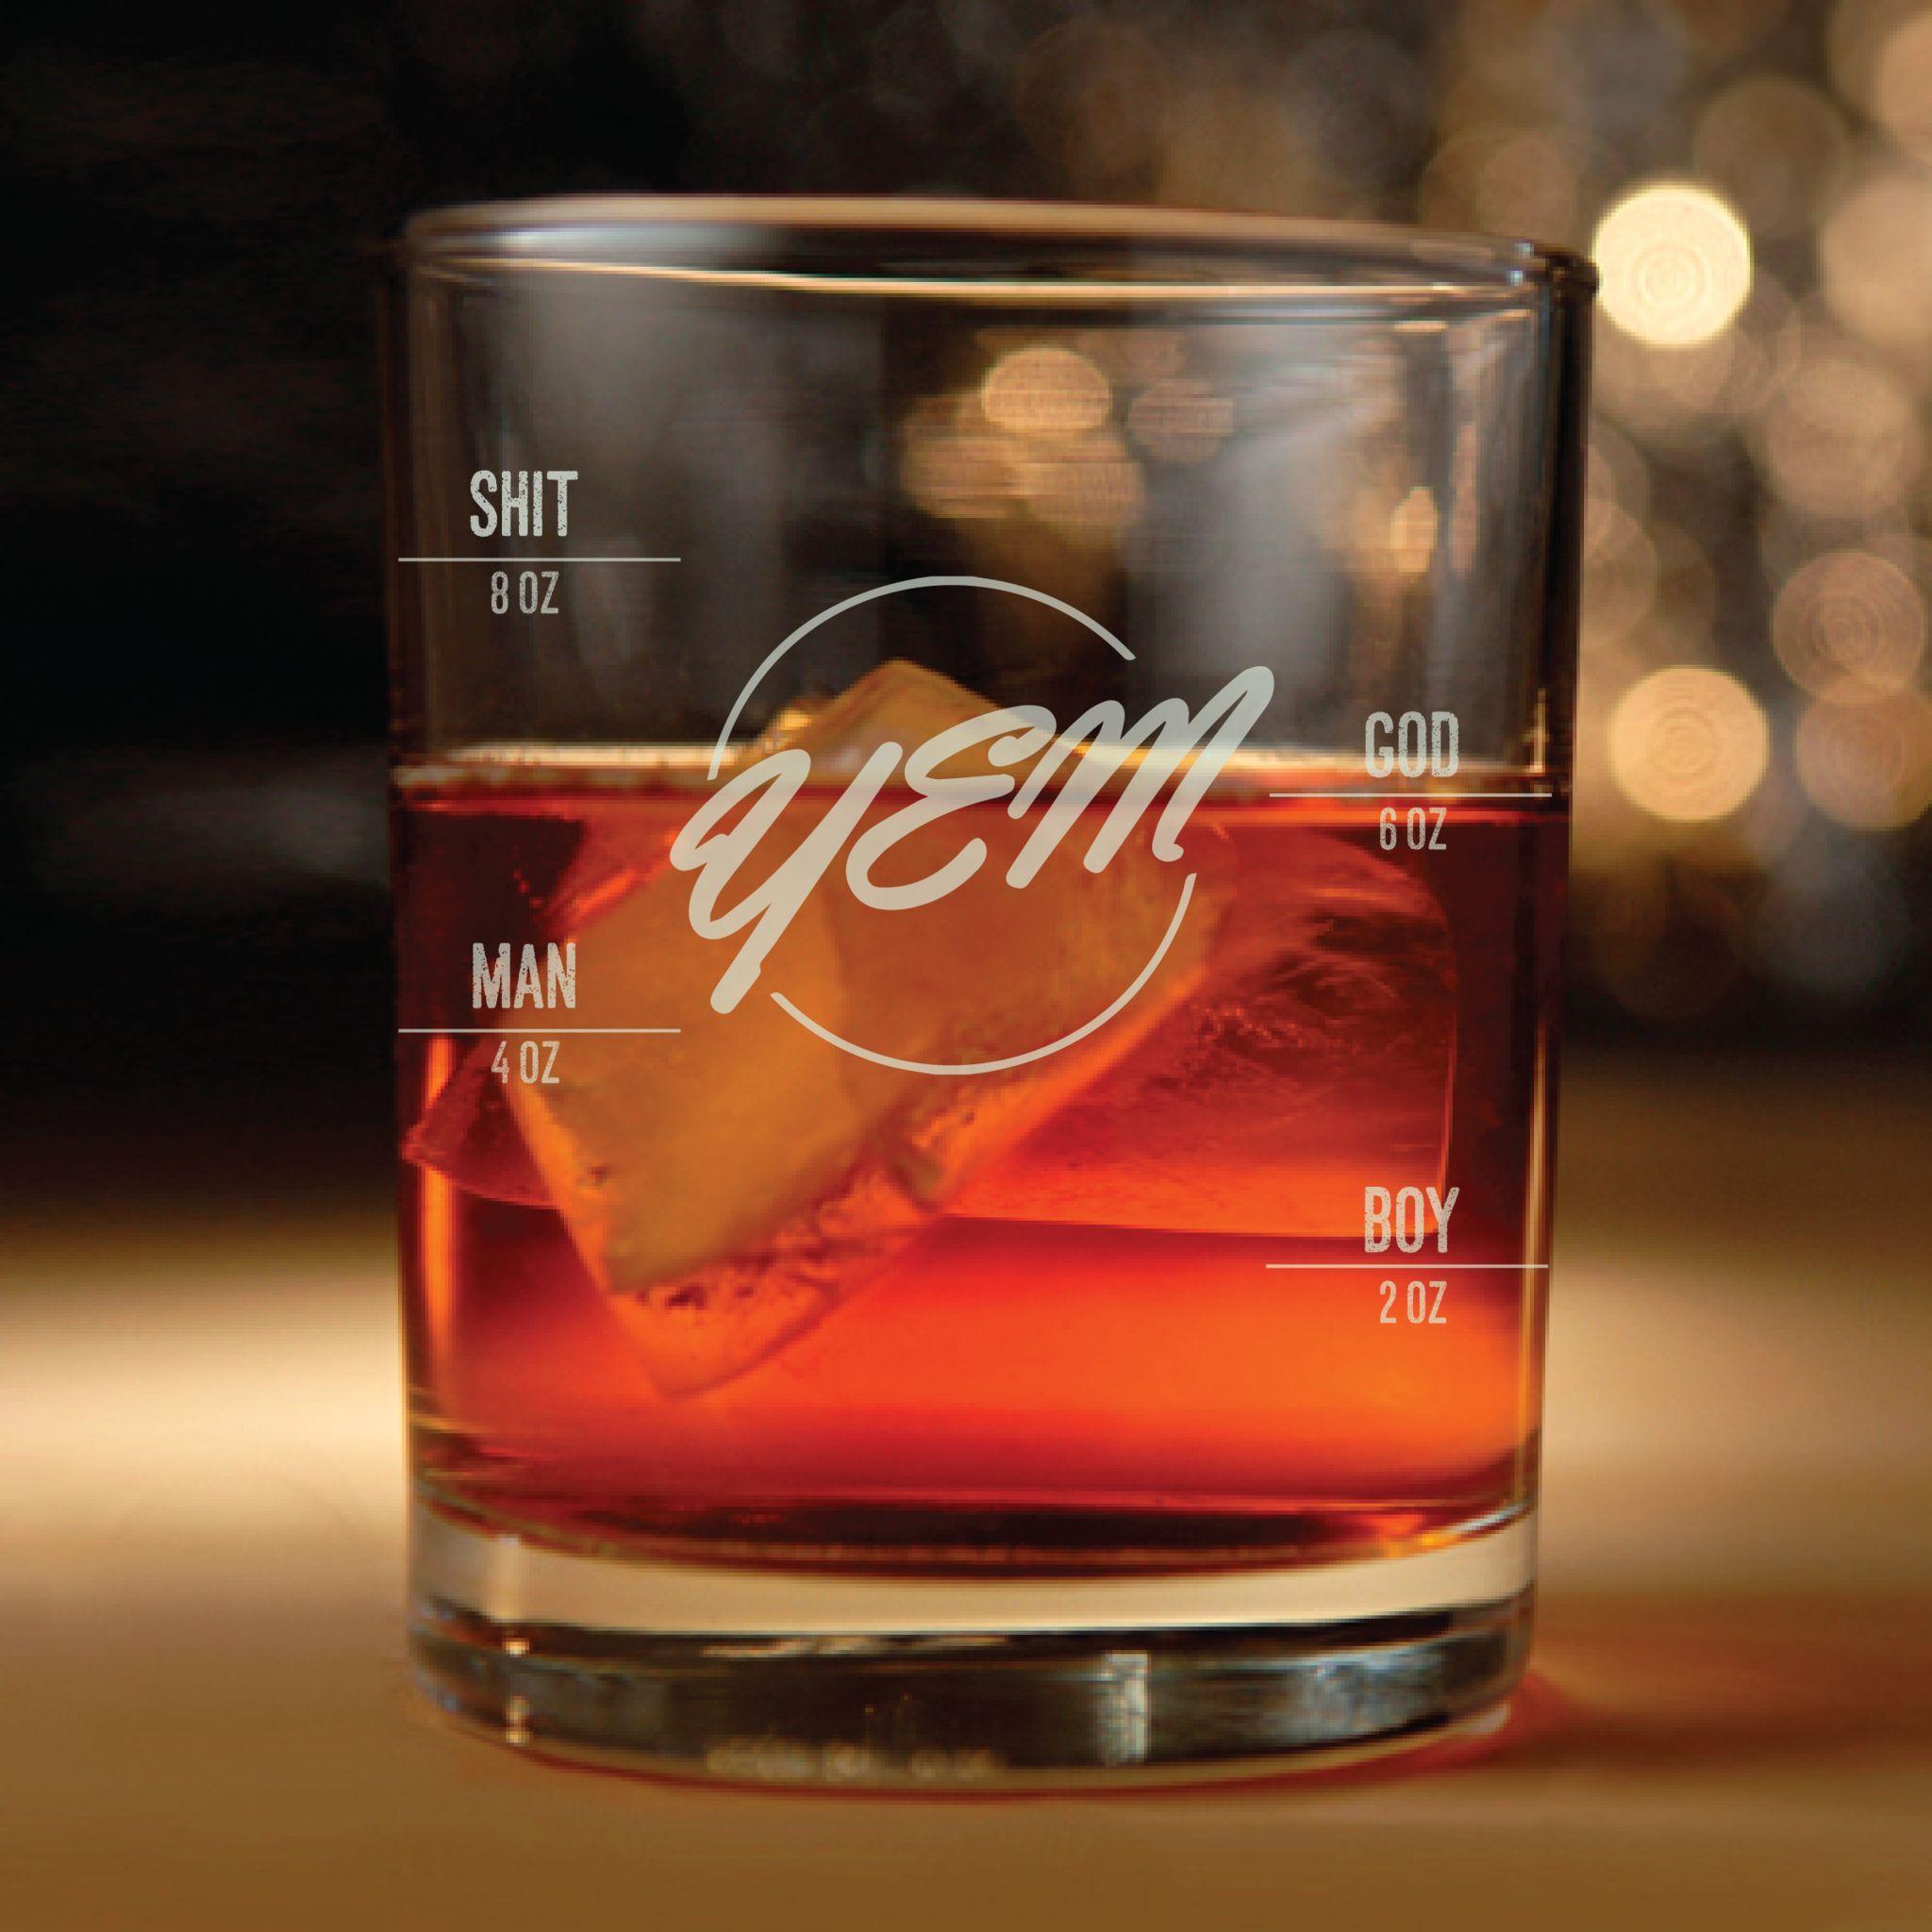 phish inspired rocks glass with measuring line yem lyrics engraved